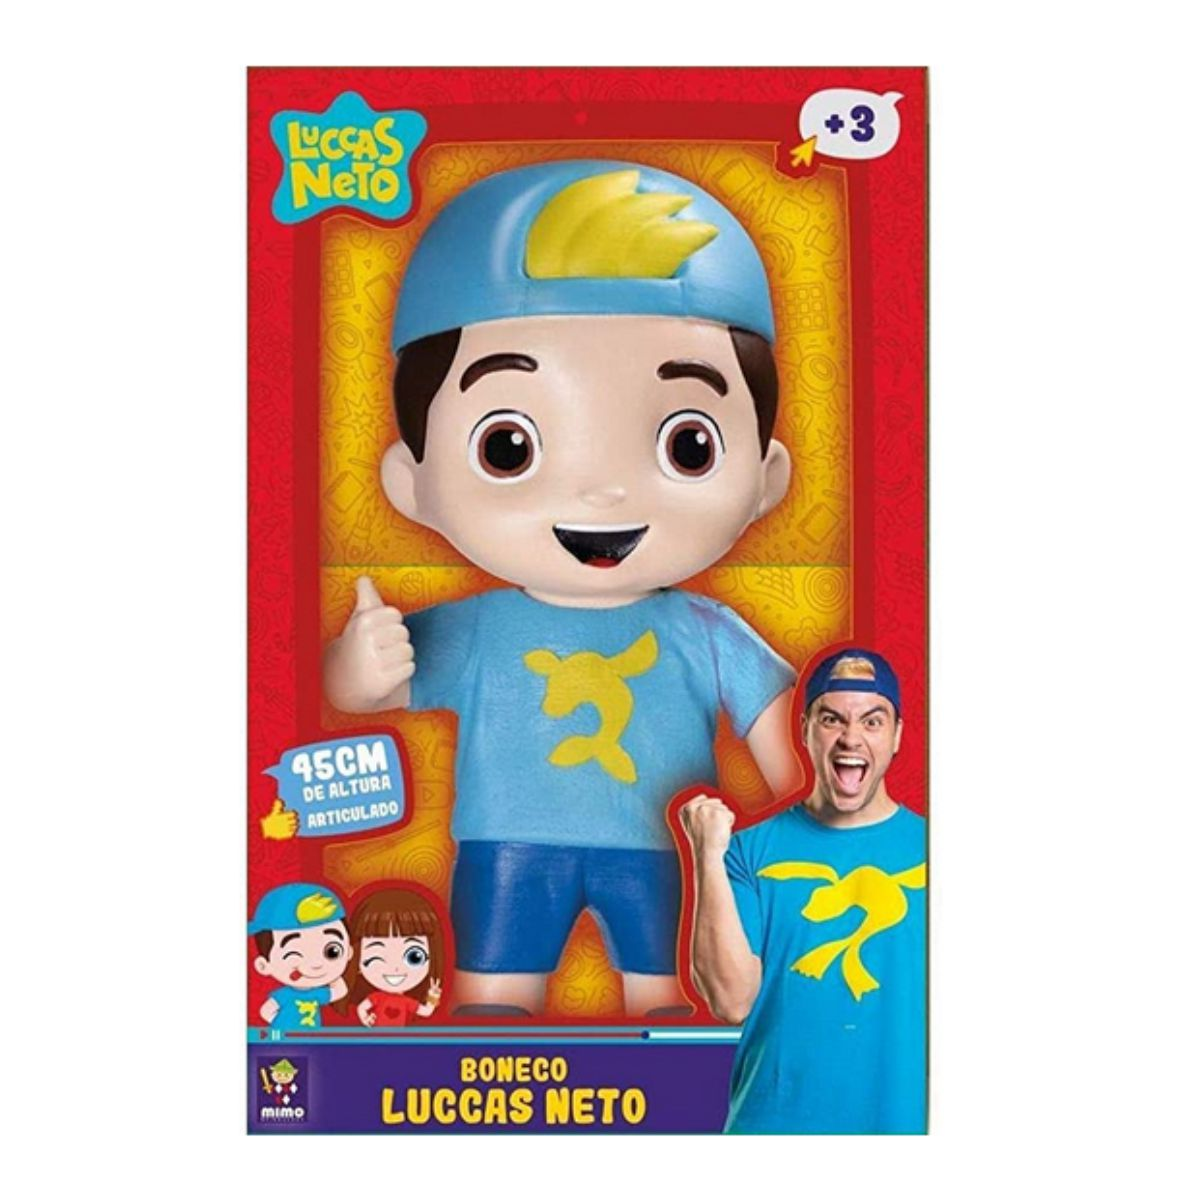 Boneco Luccas Neto 45 cm Articulado